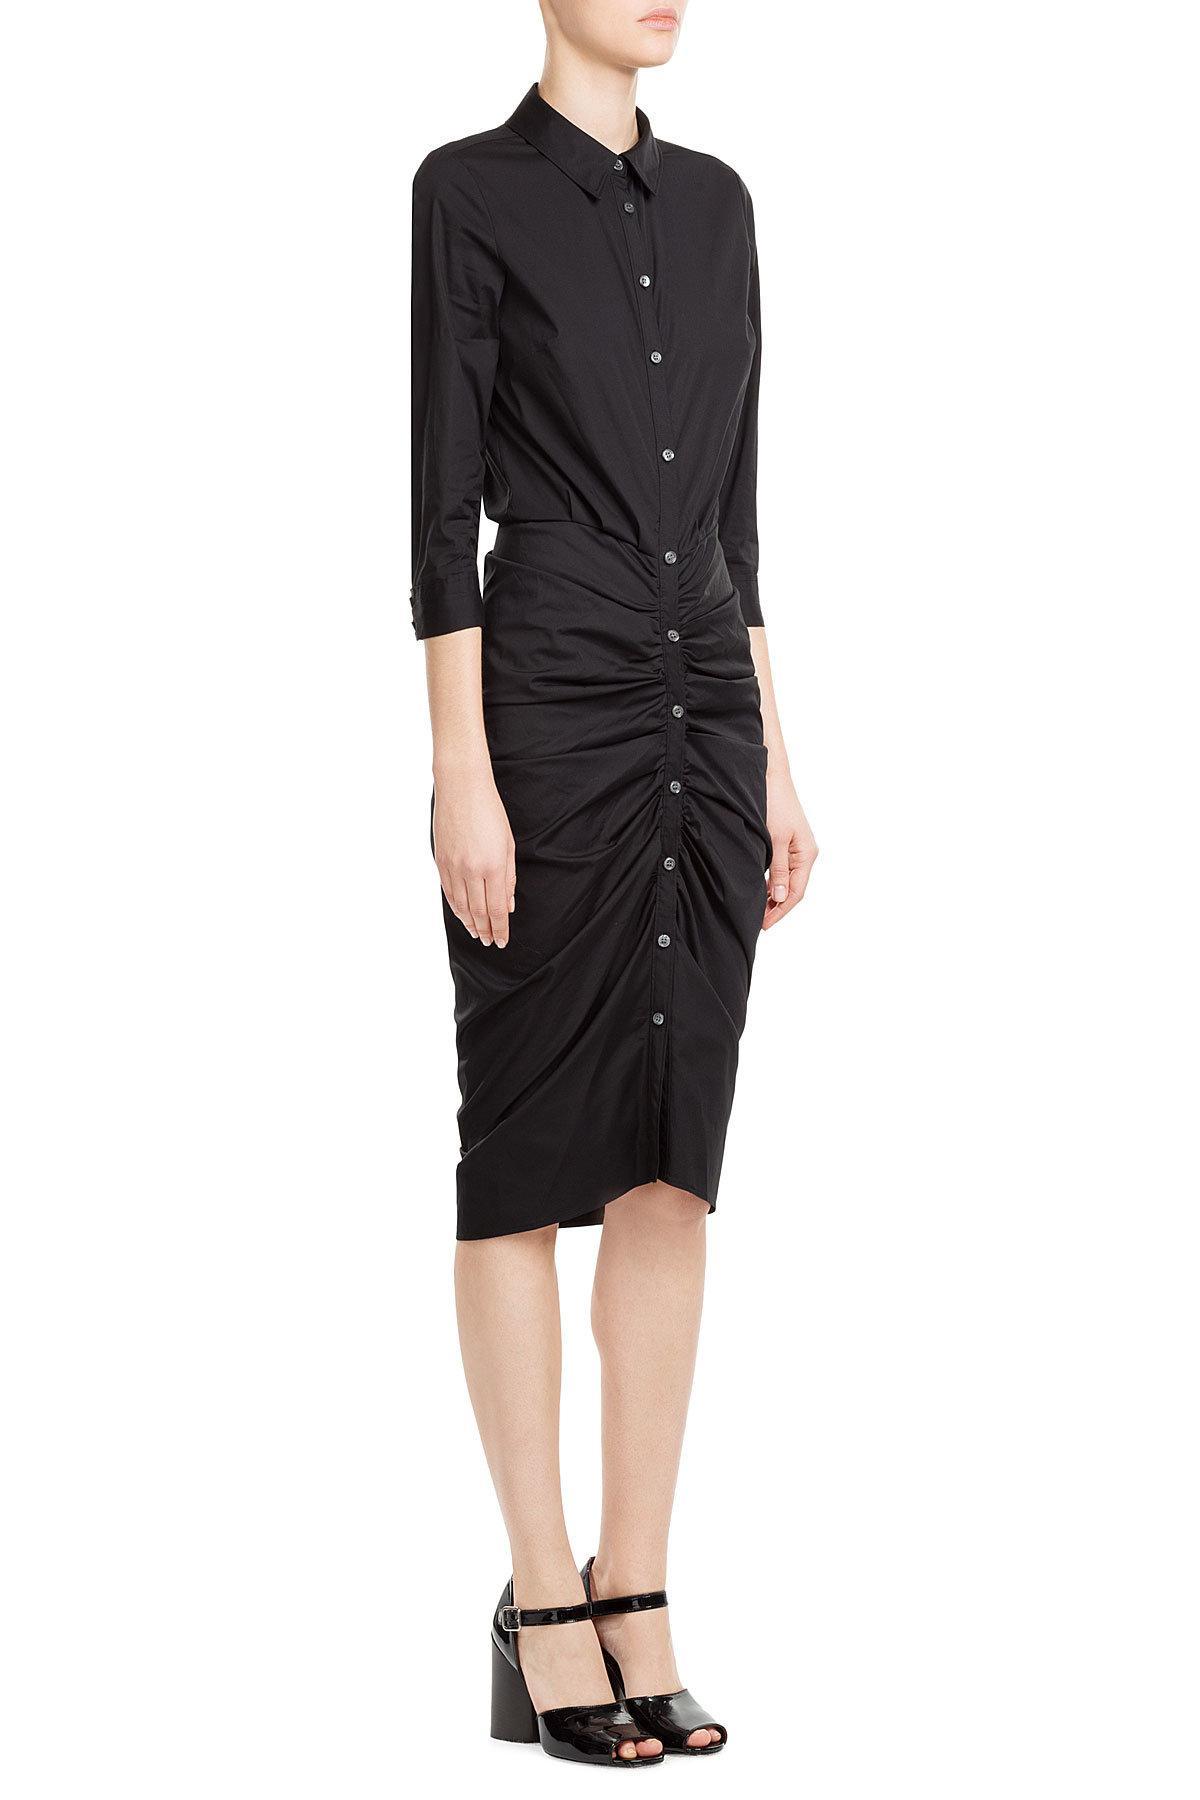 veronica beard capella cotton shirt dress in black lyst